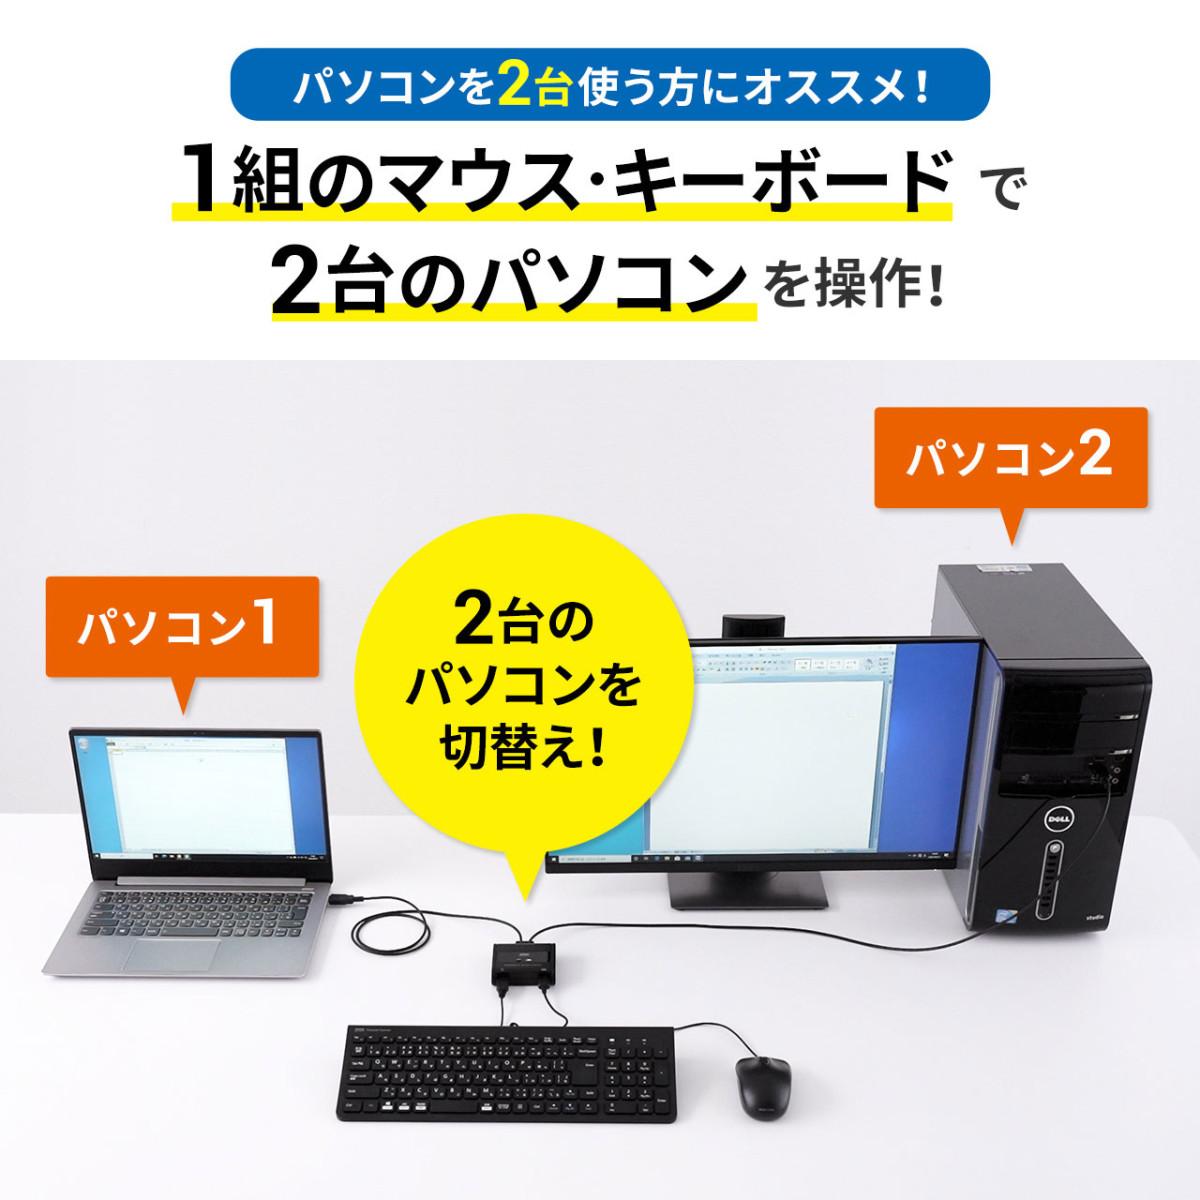 [SW-KM2UU] キーボード・マウス用パソコン切替器(2:1)